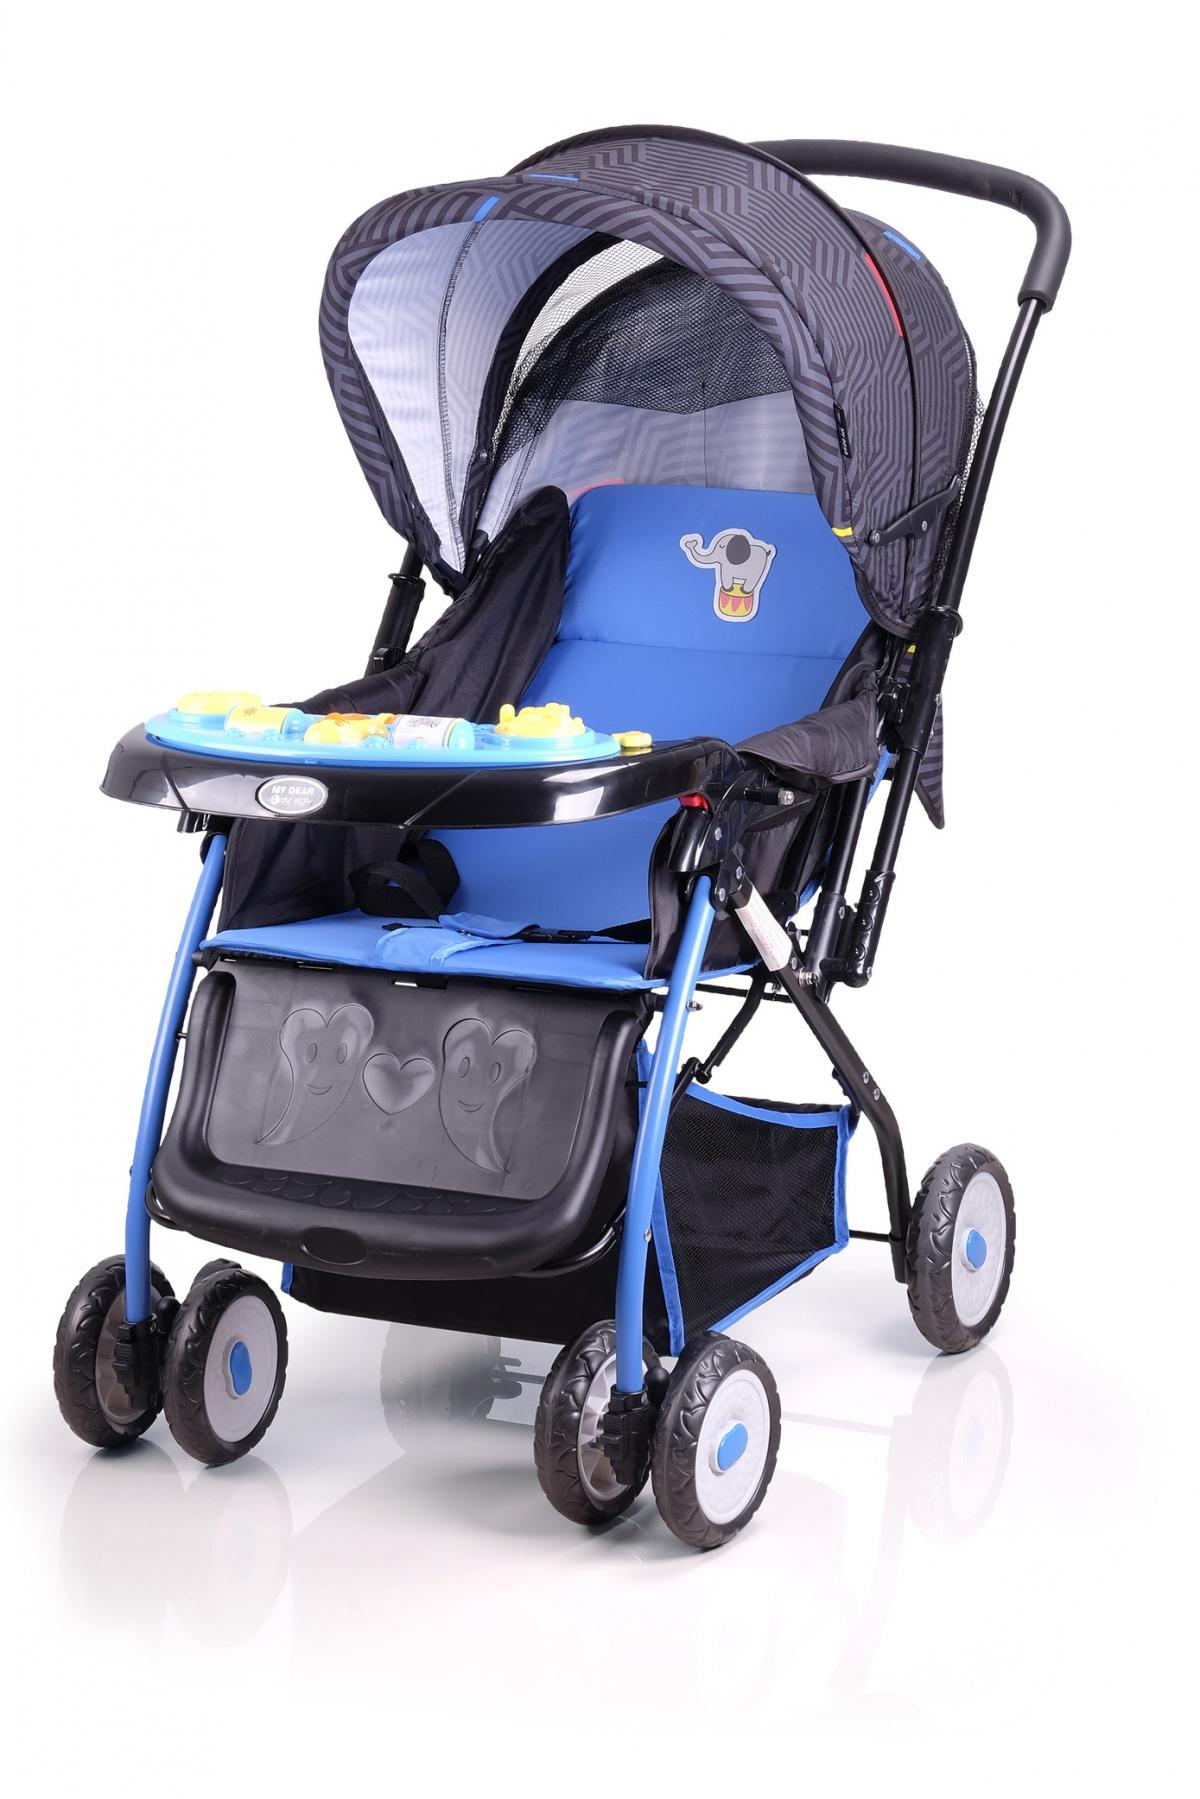 18114 Baby Stroller Baby Stroller